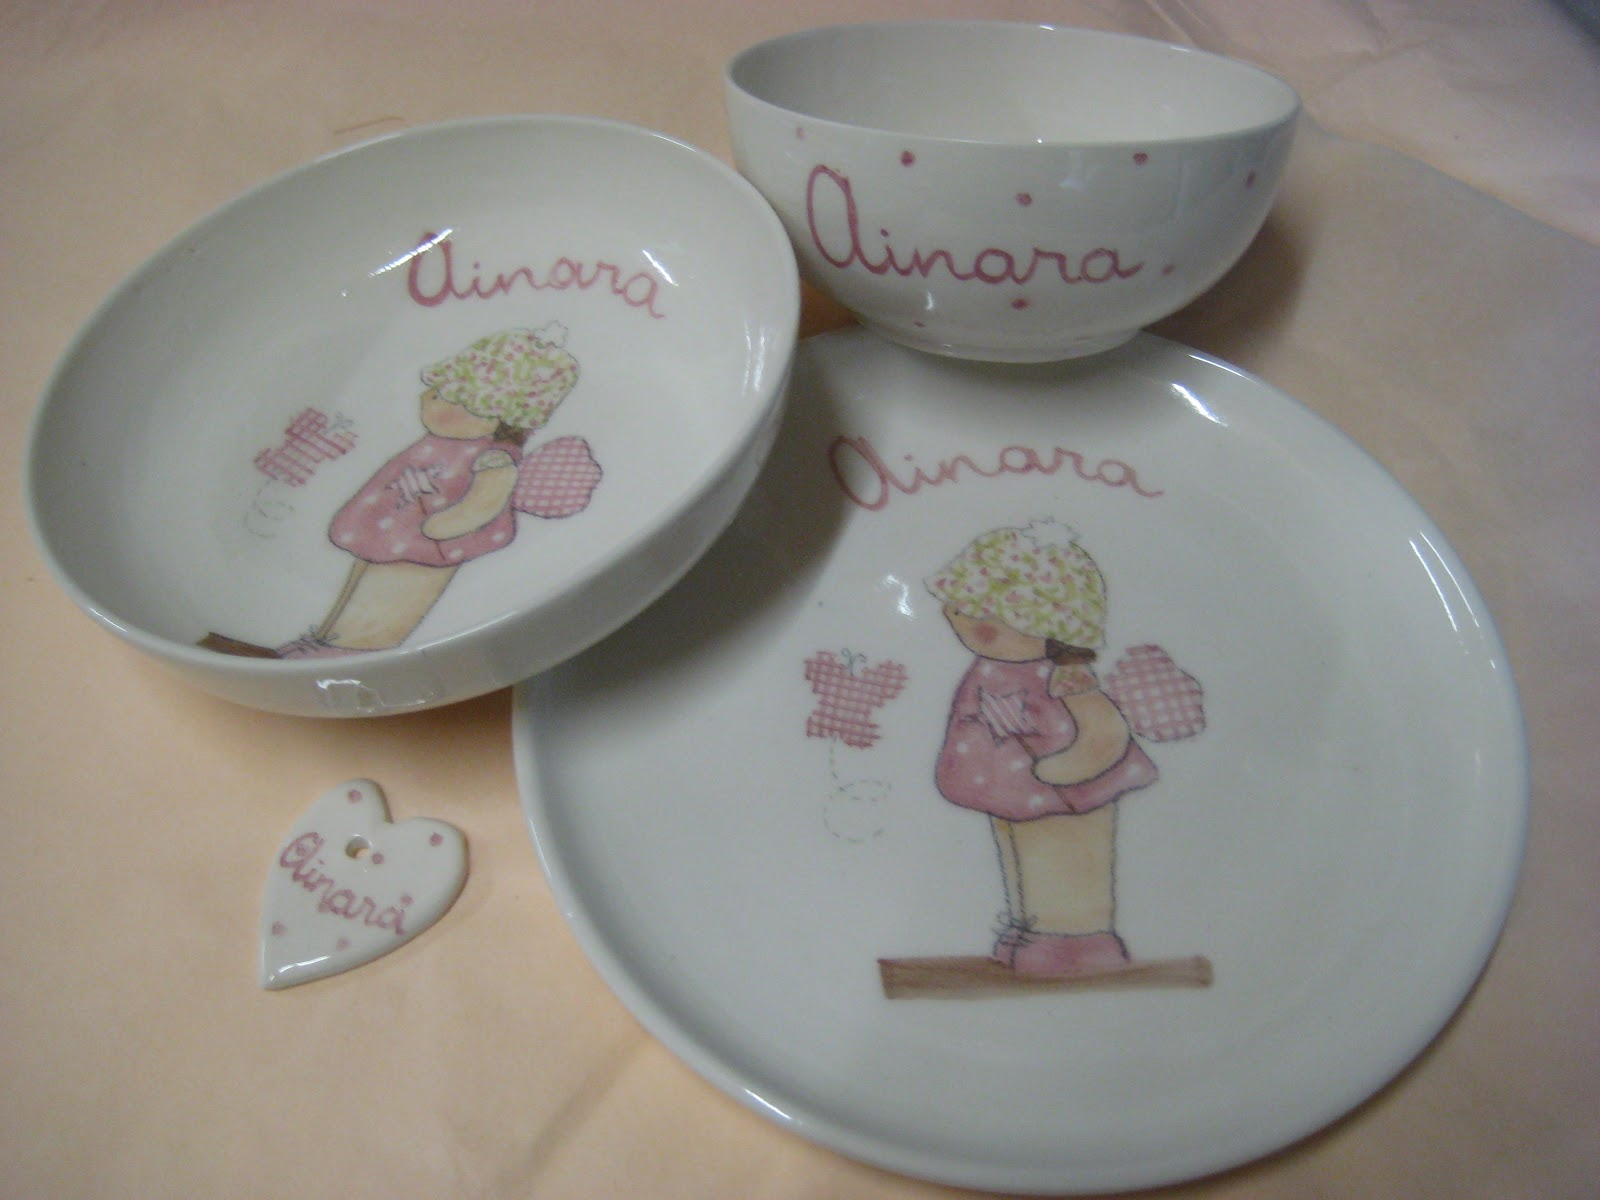 Decoraci n infantil personalizada vajillas infantiles personalizadas con nombre - Vajilla ceramica artesanal ...